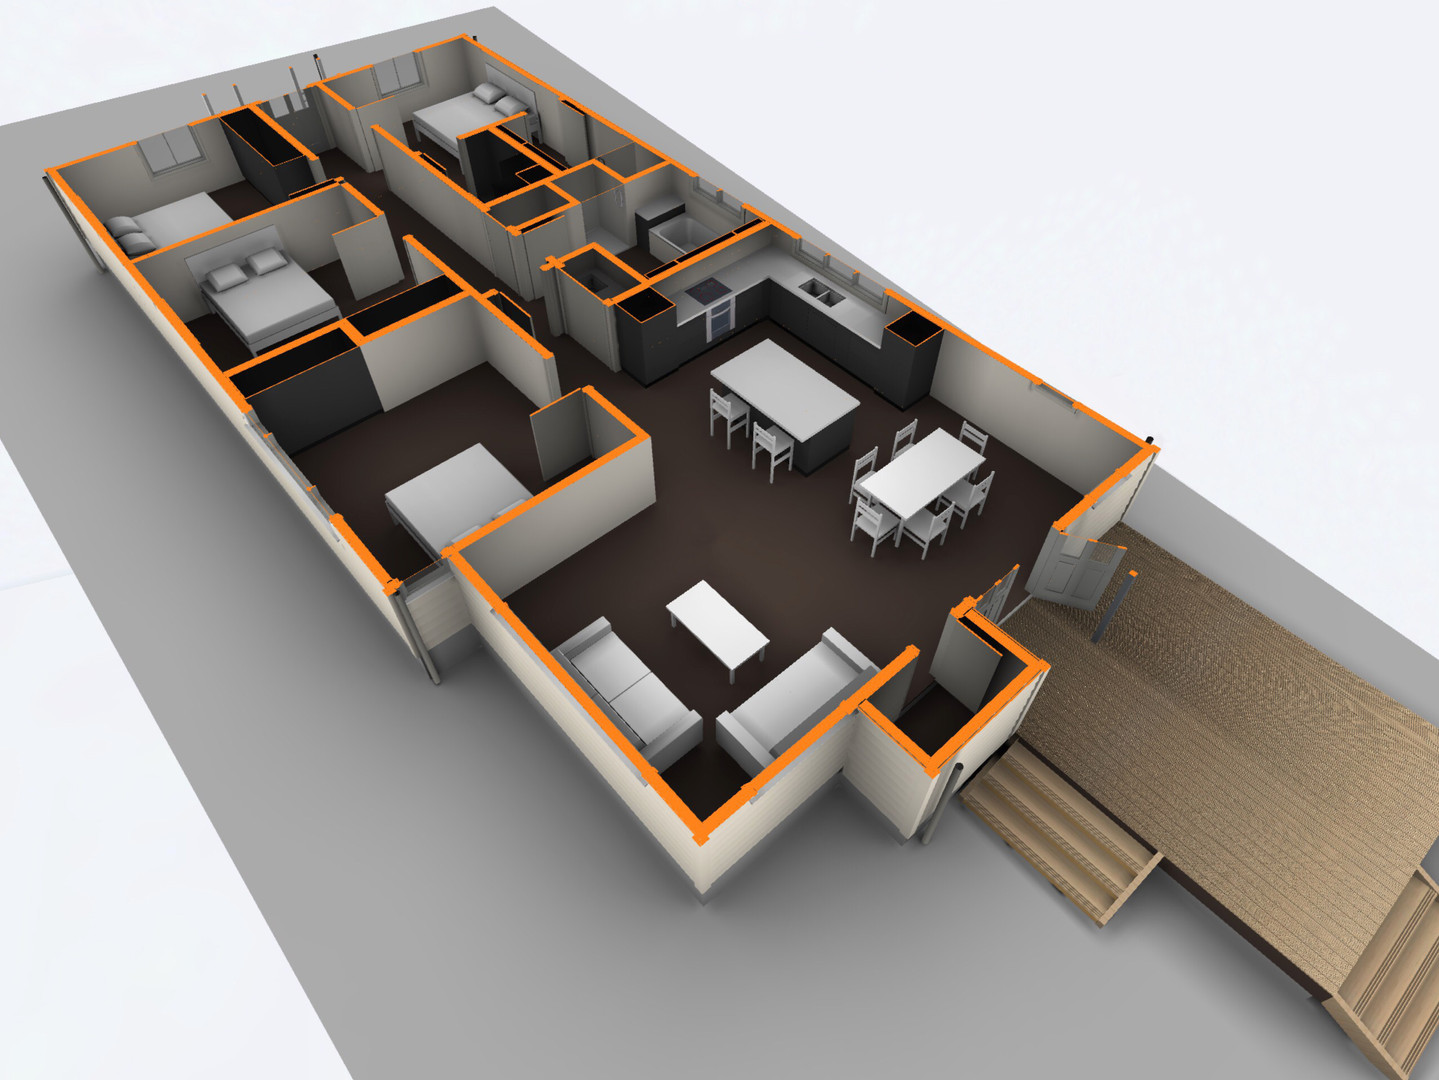 Randwick-Crescent-1-Proposed.jpg